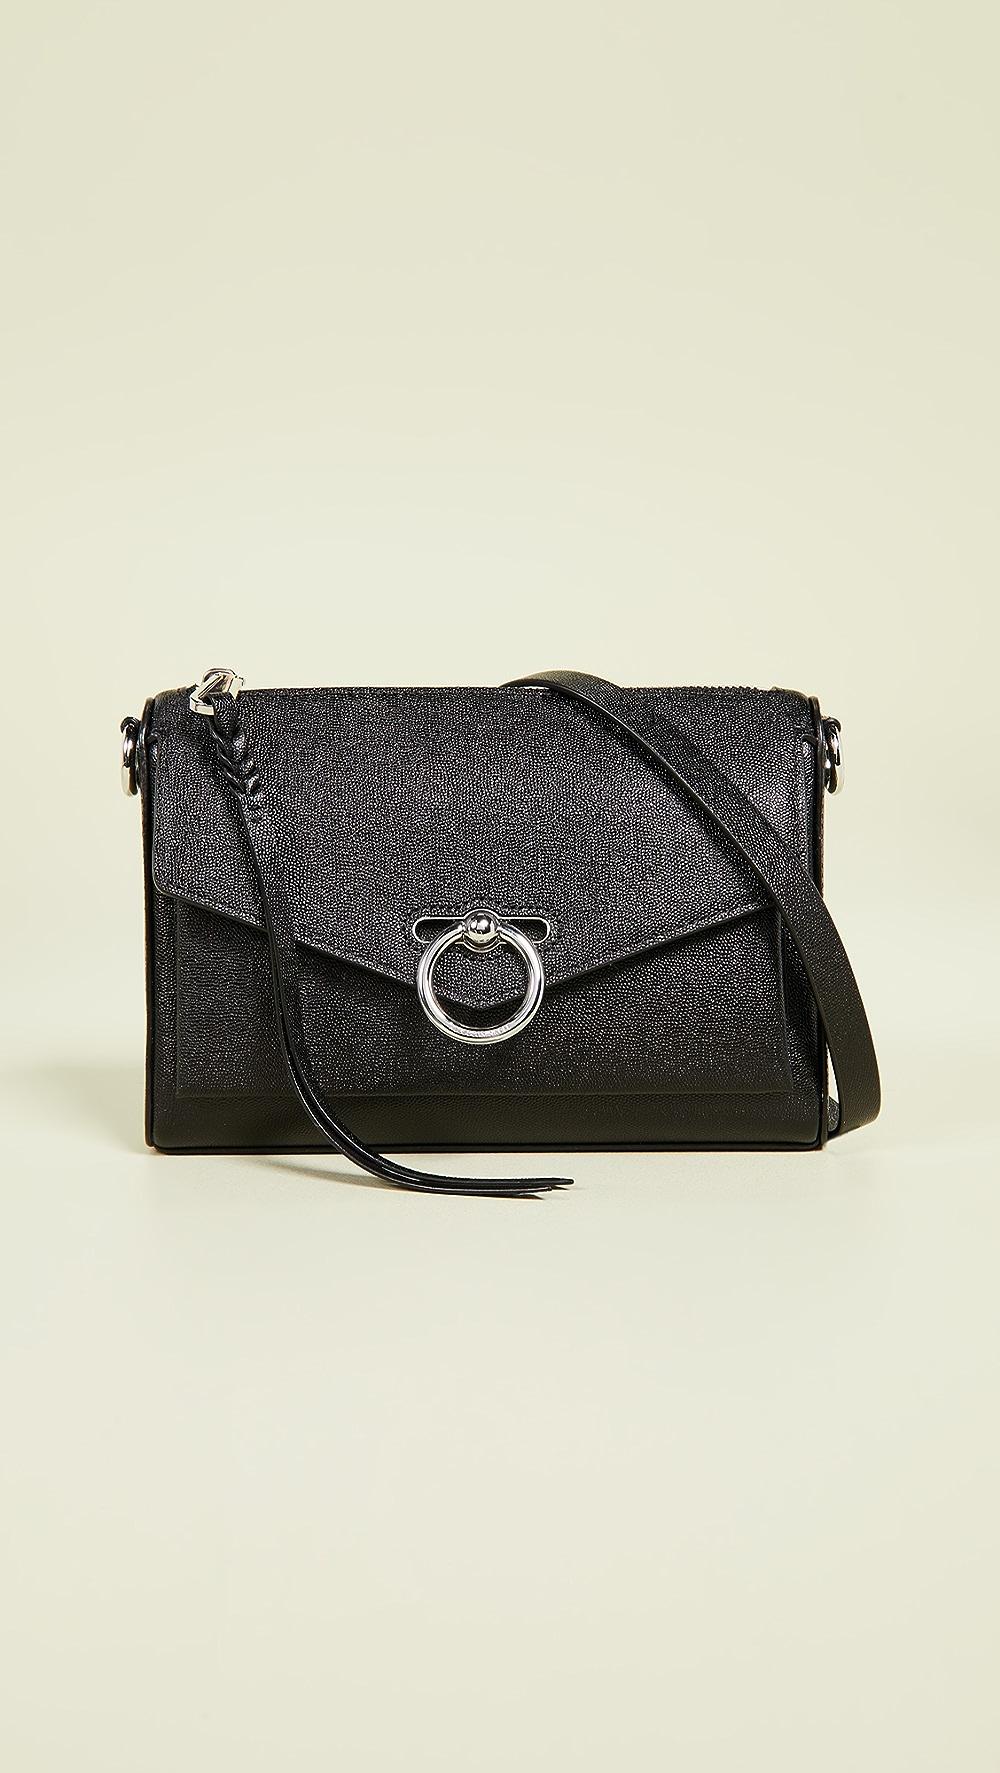 2019 Latest Design Rebecca Minkoff - Jean Mac Crossbody Bag Fashionable Patterns